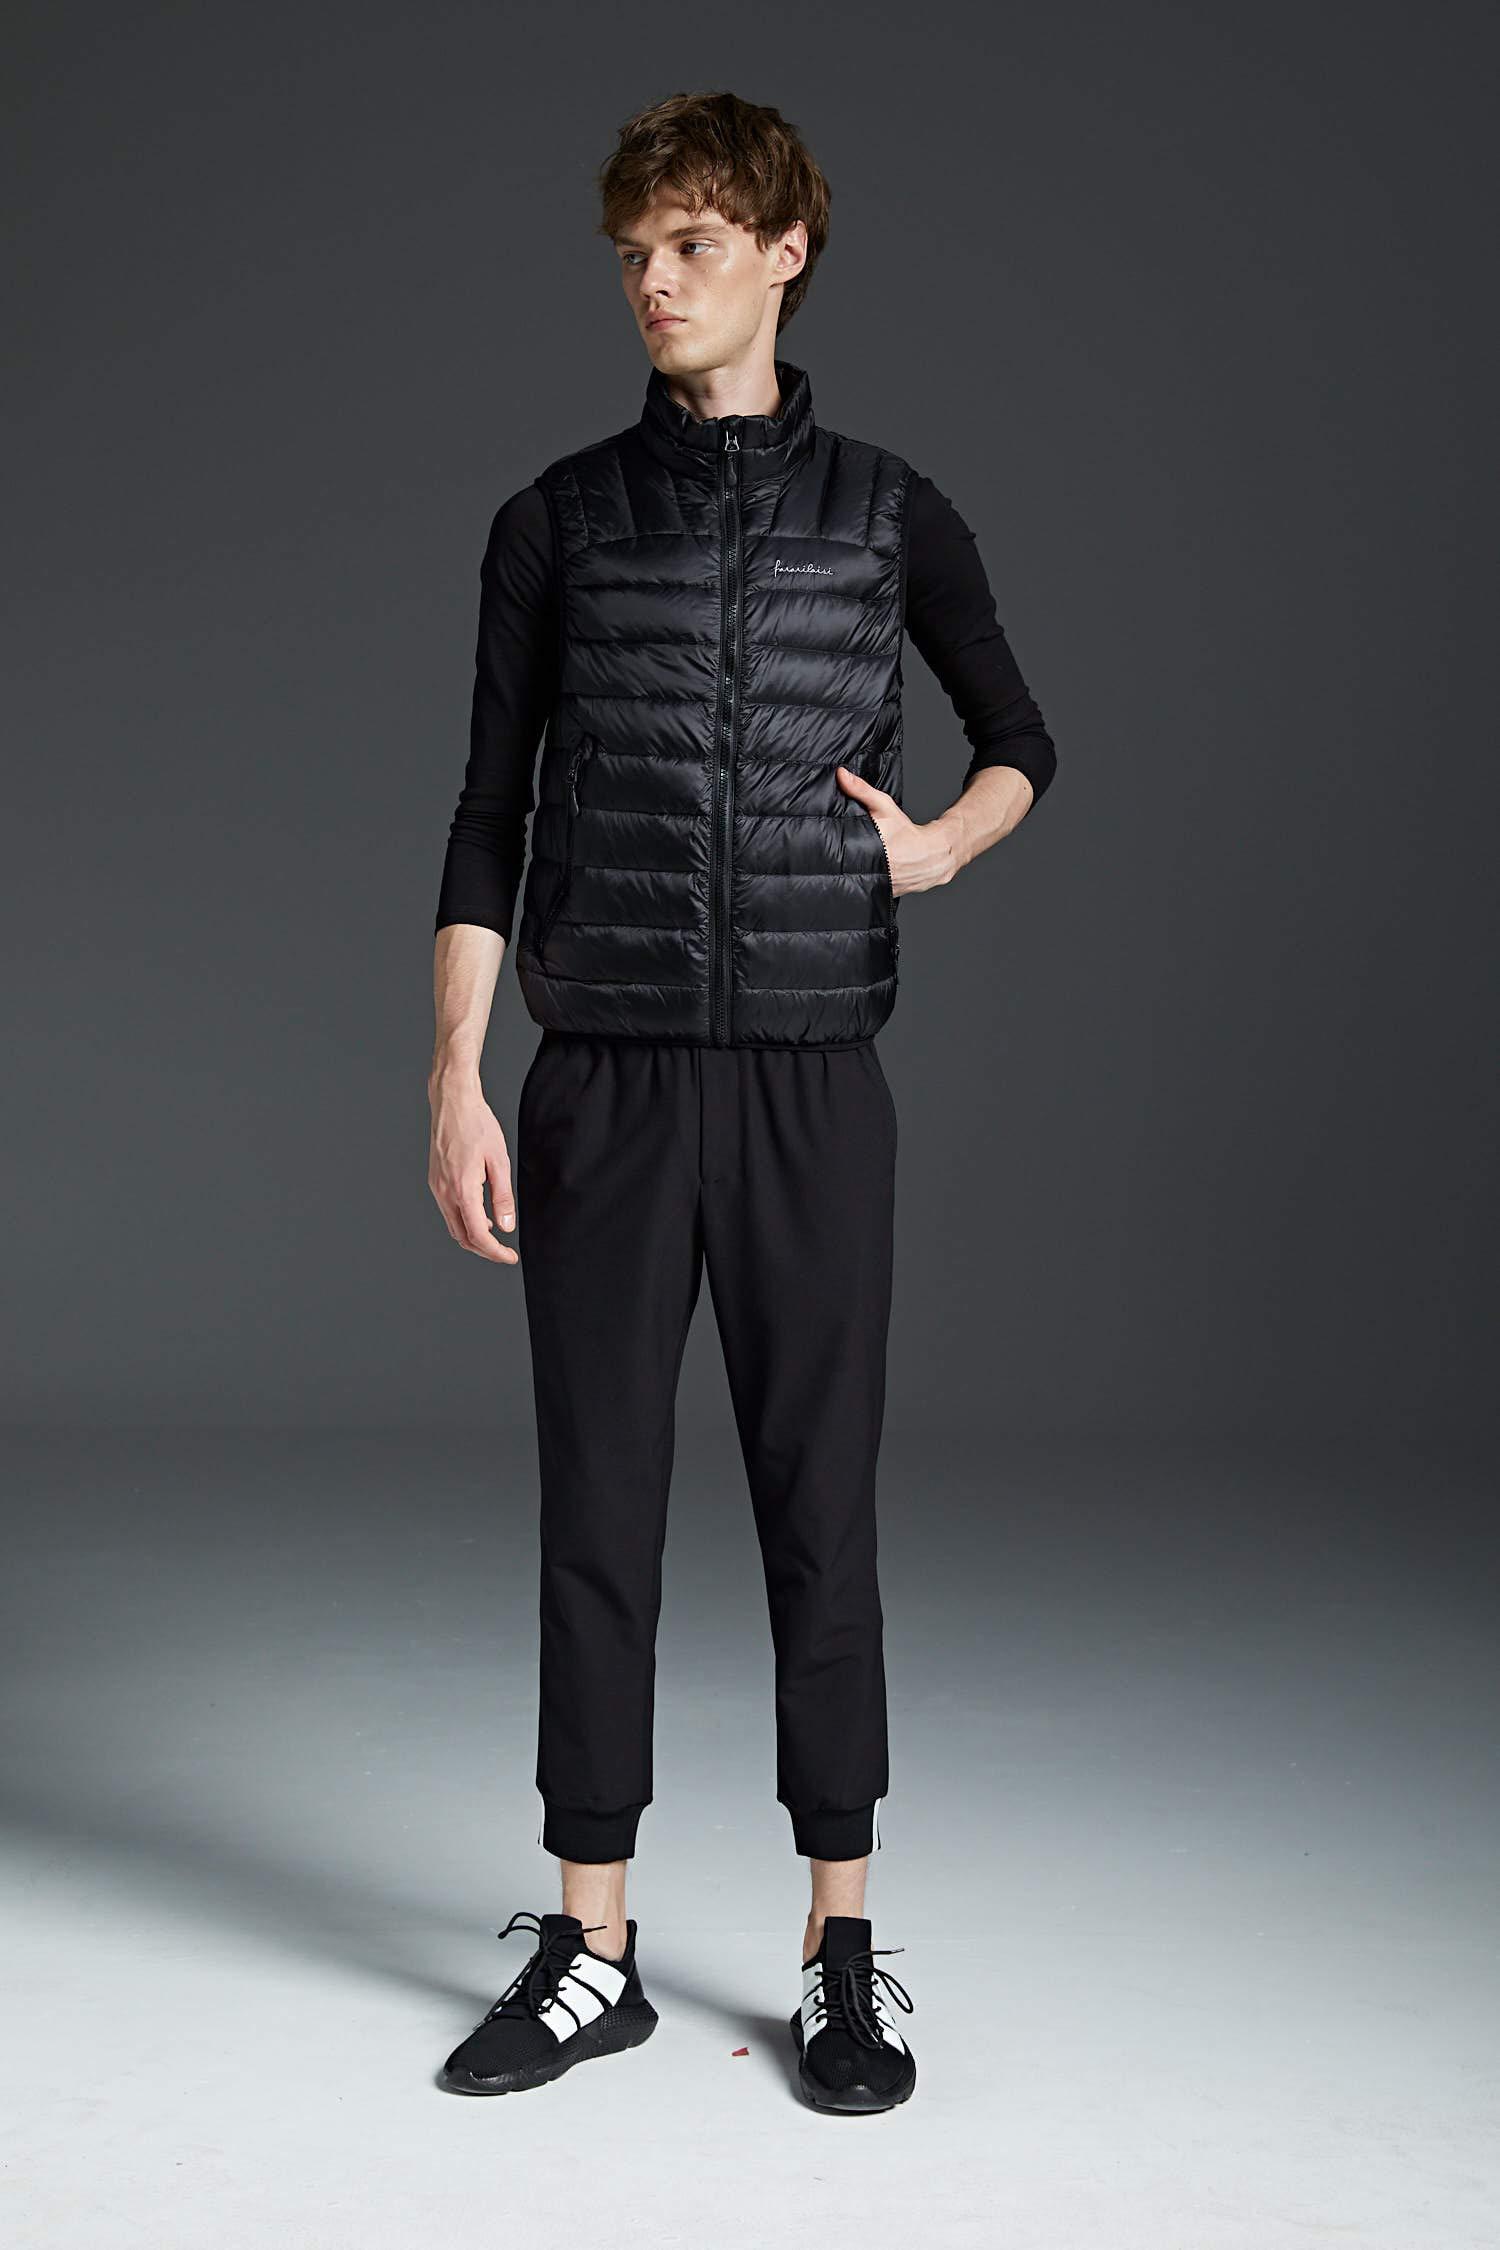 71 XyFuv5FL - NBWS Men's Down Vest Quilted Gilet Mandarin Collar Vest Bodywarmer Sleeveless Slim-fit Outdoor Vests